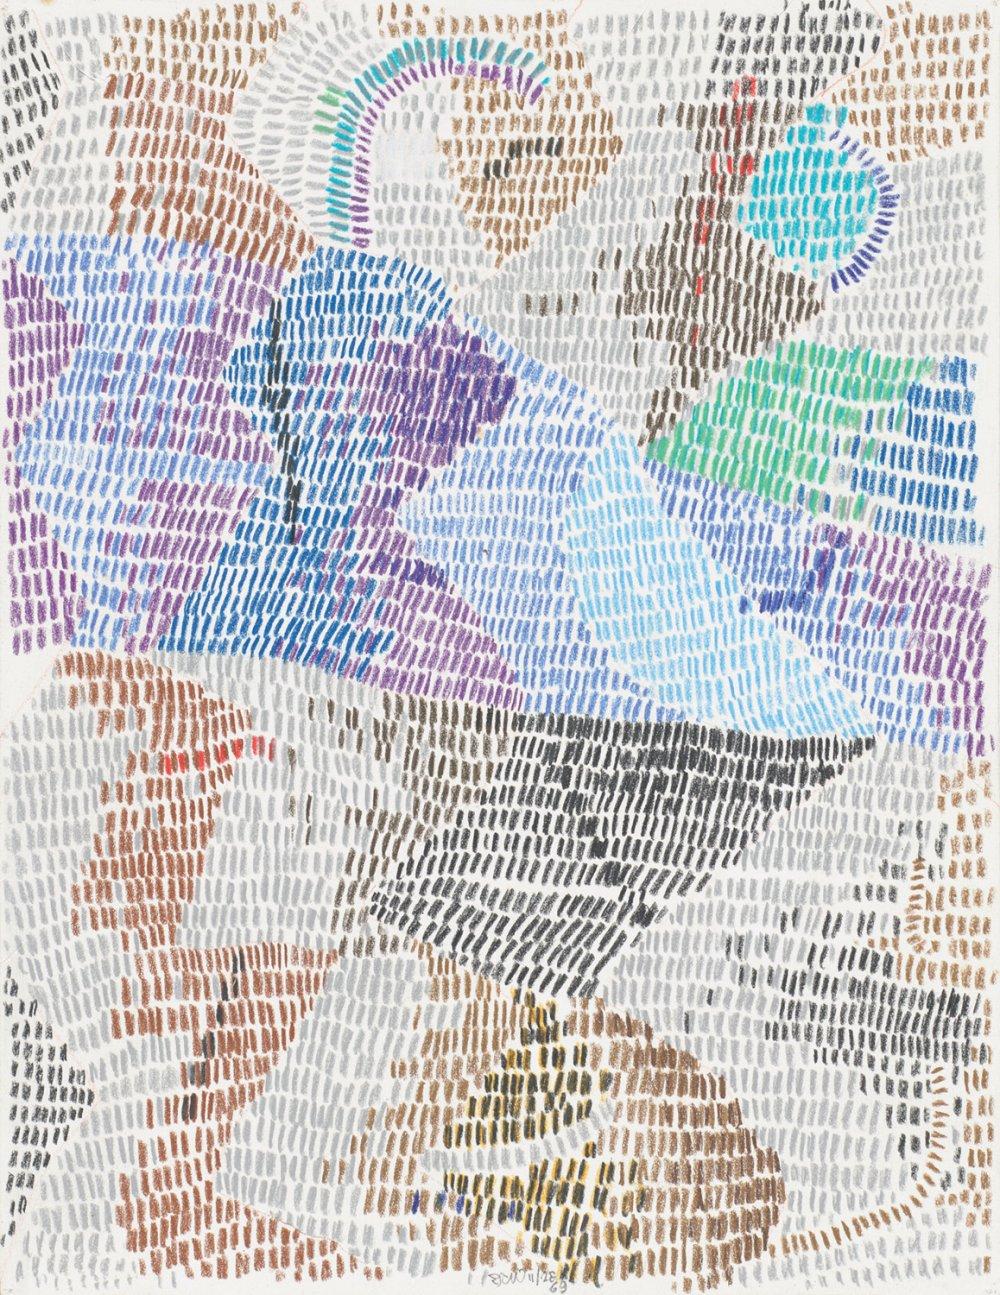 Untitled (6962)